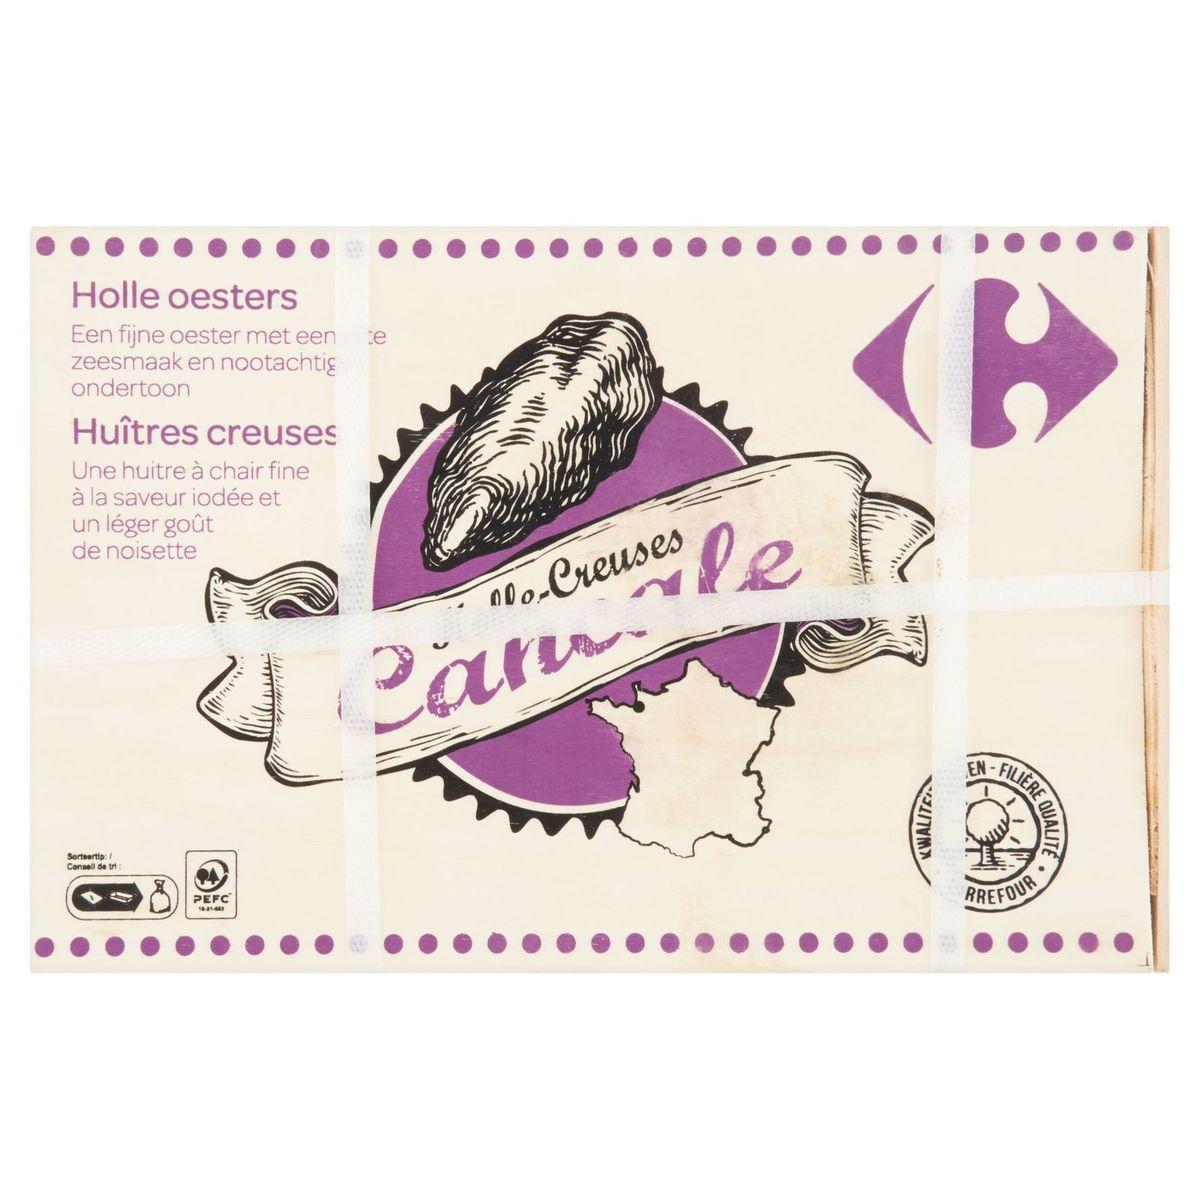 Carrefour Krystale Huîtres Creuses N2 12 Pcs